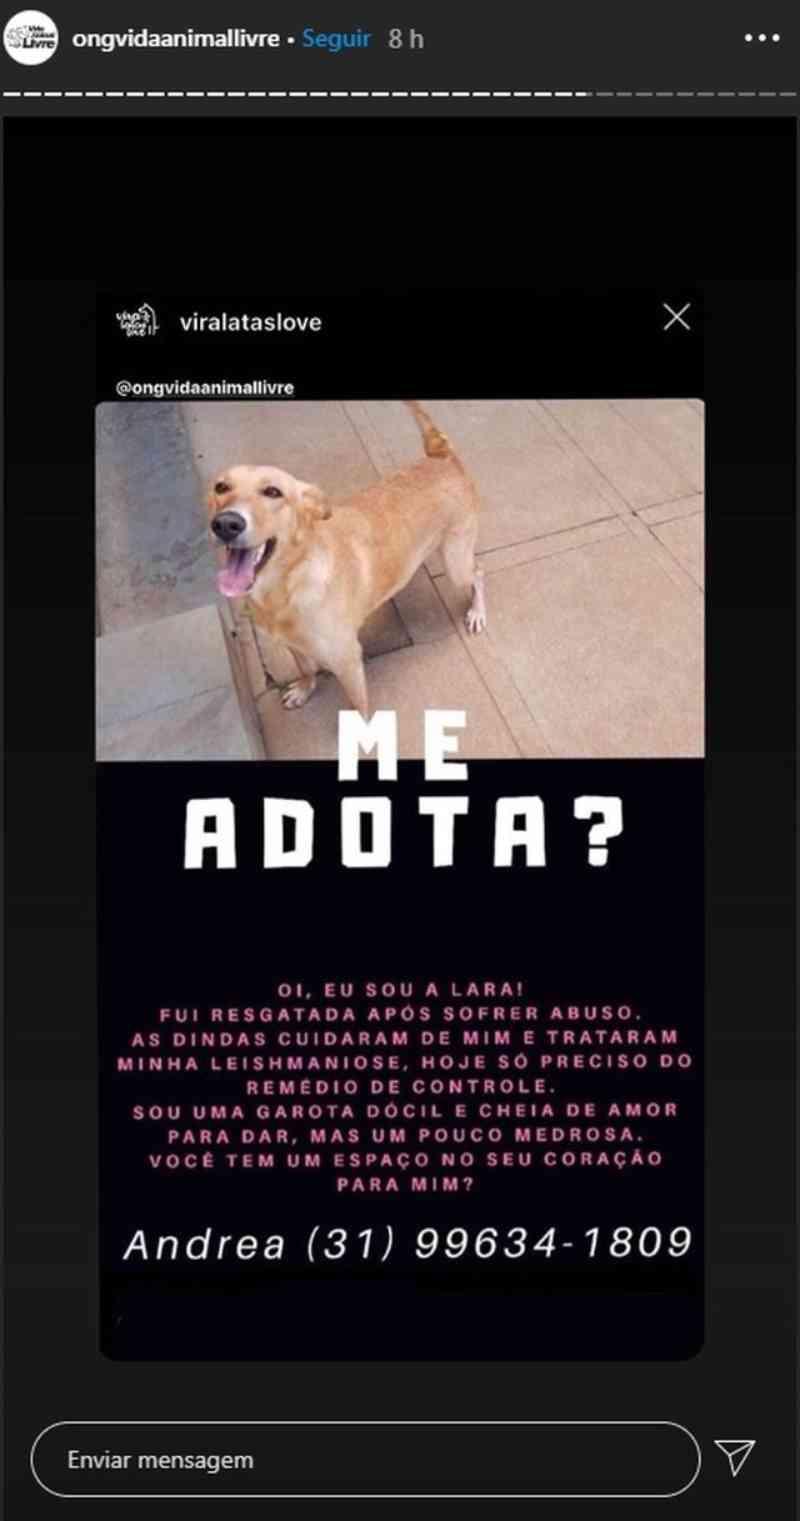 Prefeitura de Belo Horizonte (MG) e ONGs alertam para aumento de abandono de animais durante a pandemia